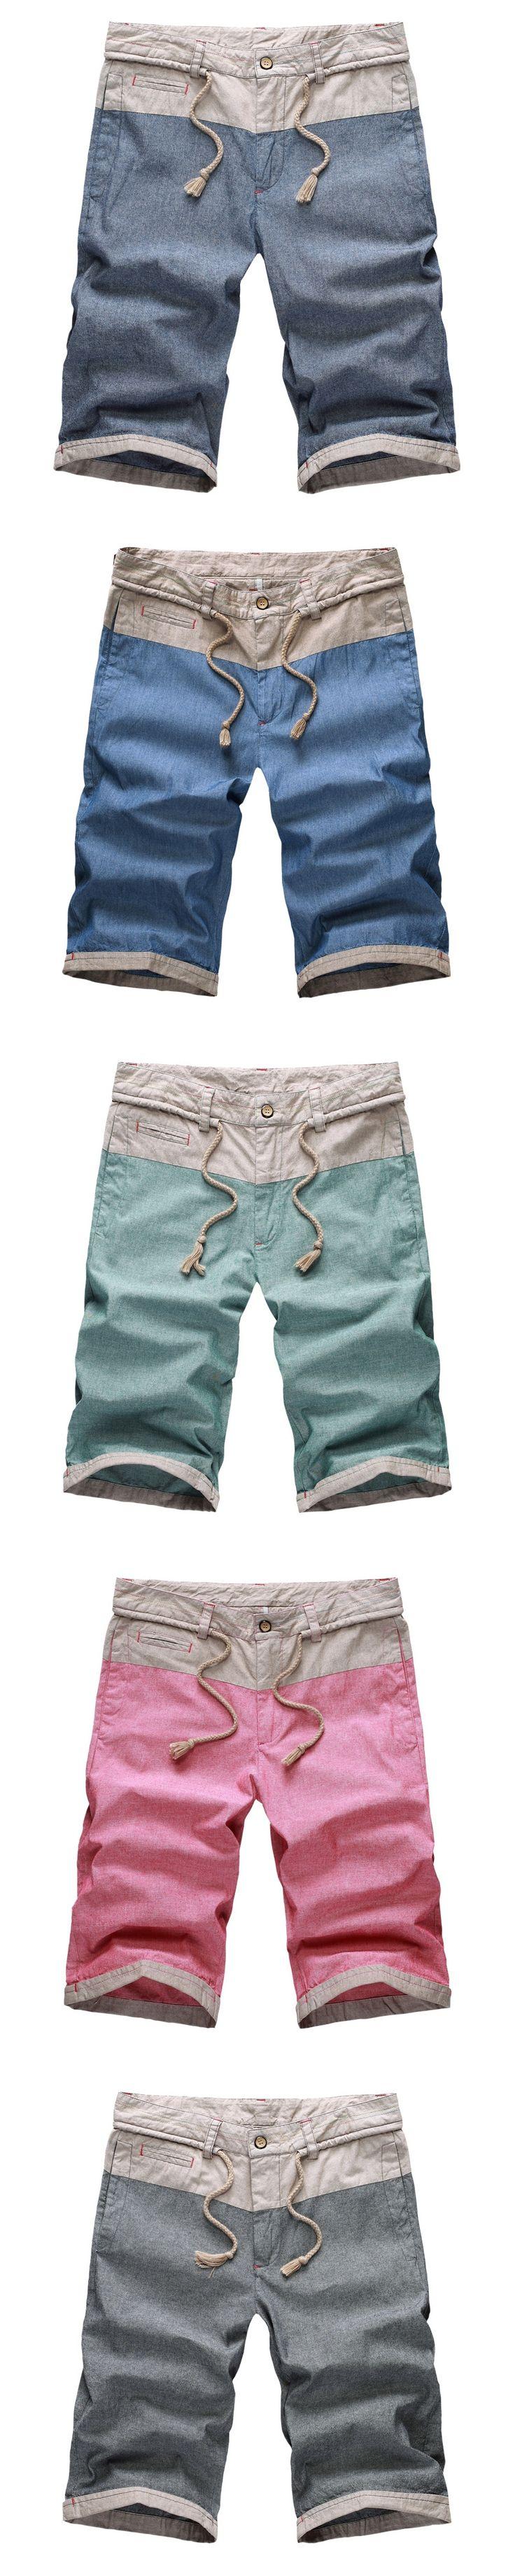 2017 New Fashion Summer Casual short Patchwork Mens Shorts Pantalones Cortos Hombre Denim Men  Cargo Shorts 13M0611